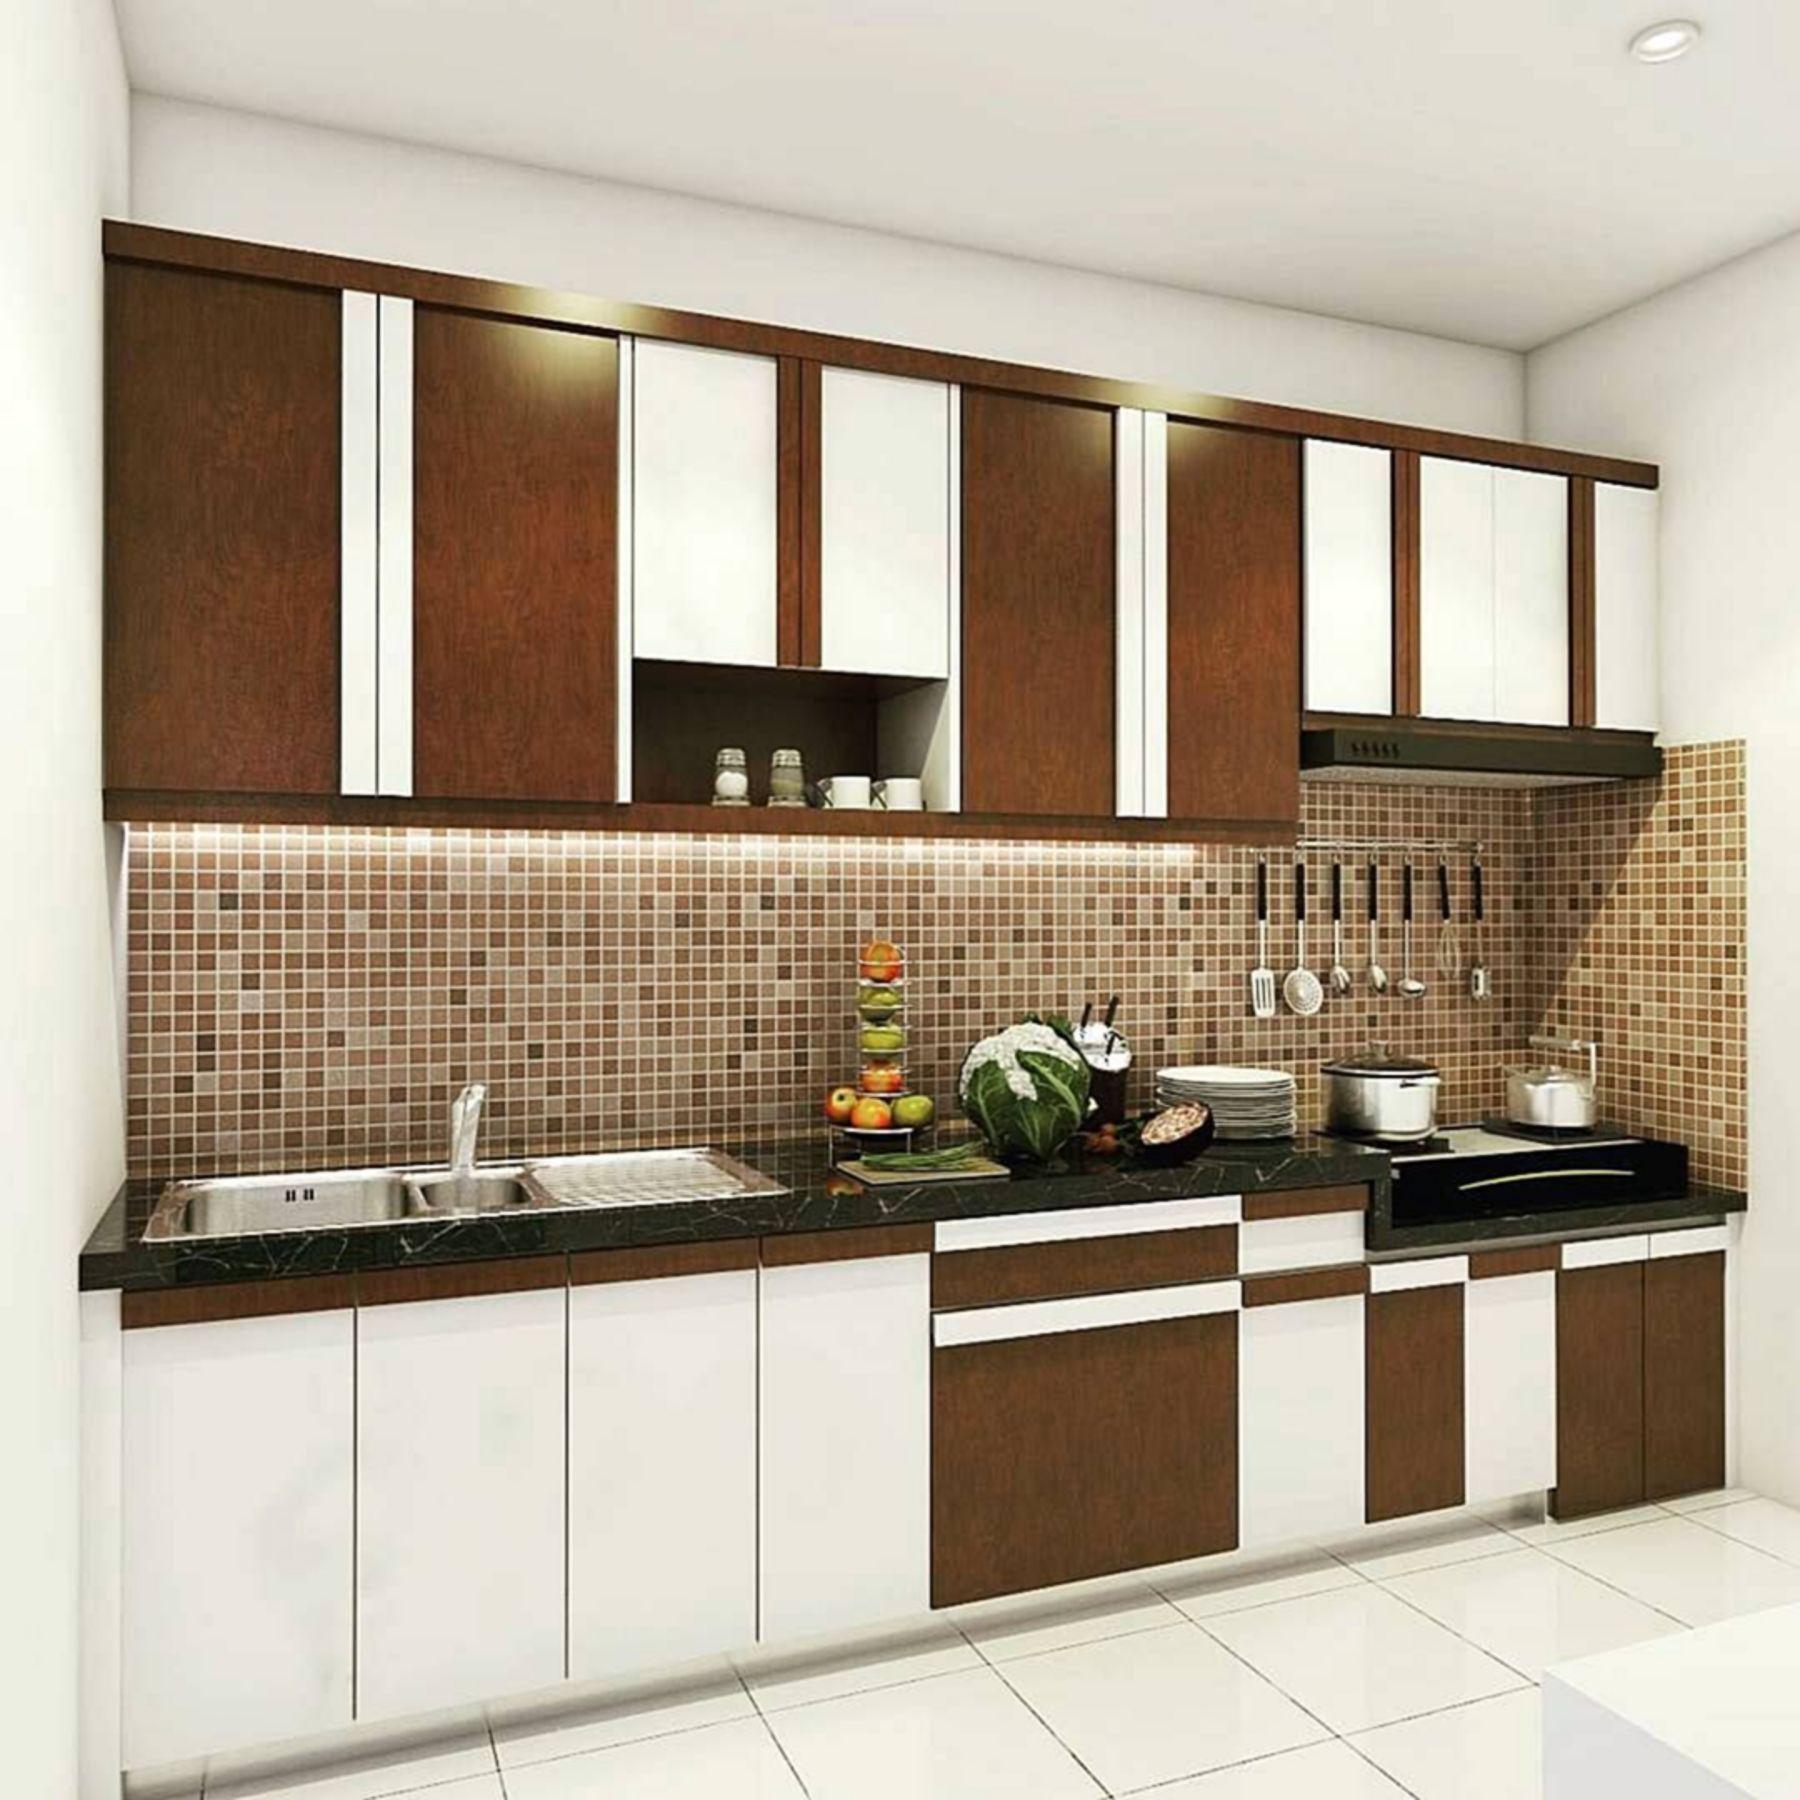 Interesting 10+ Minimalist Kitchen Set Design Ideas For ...